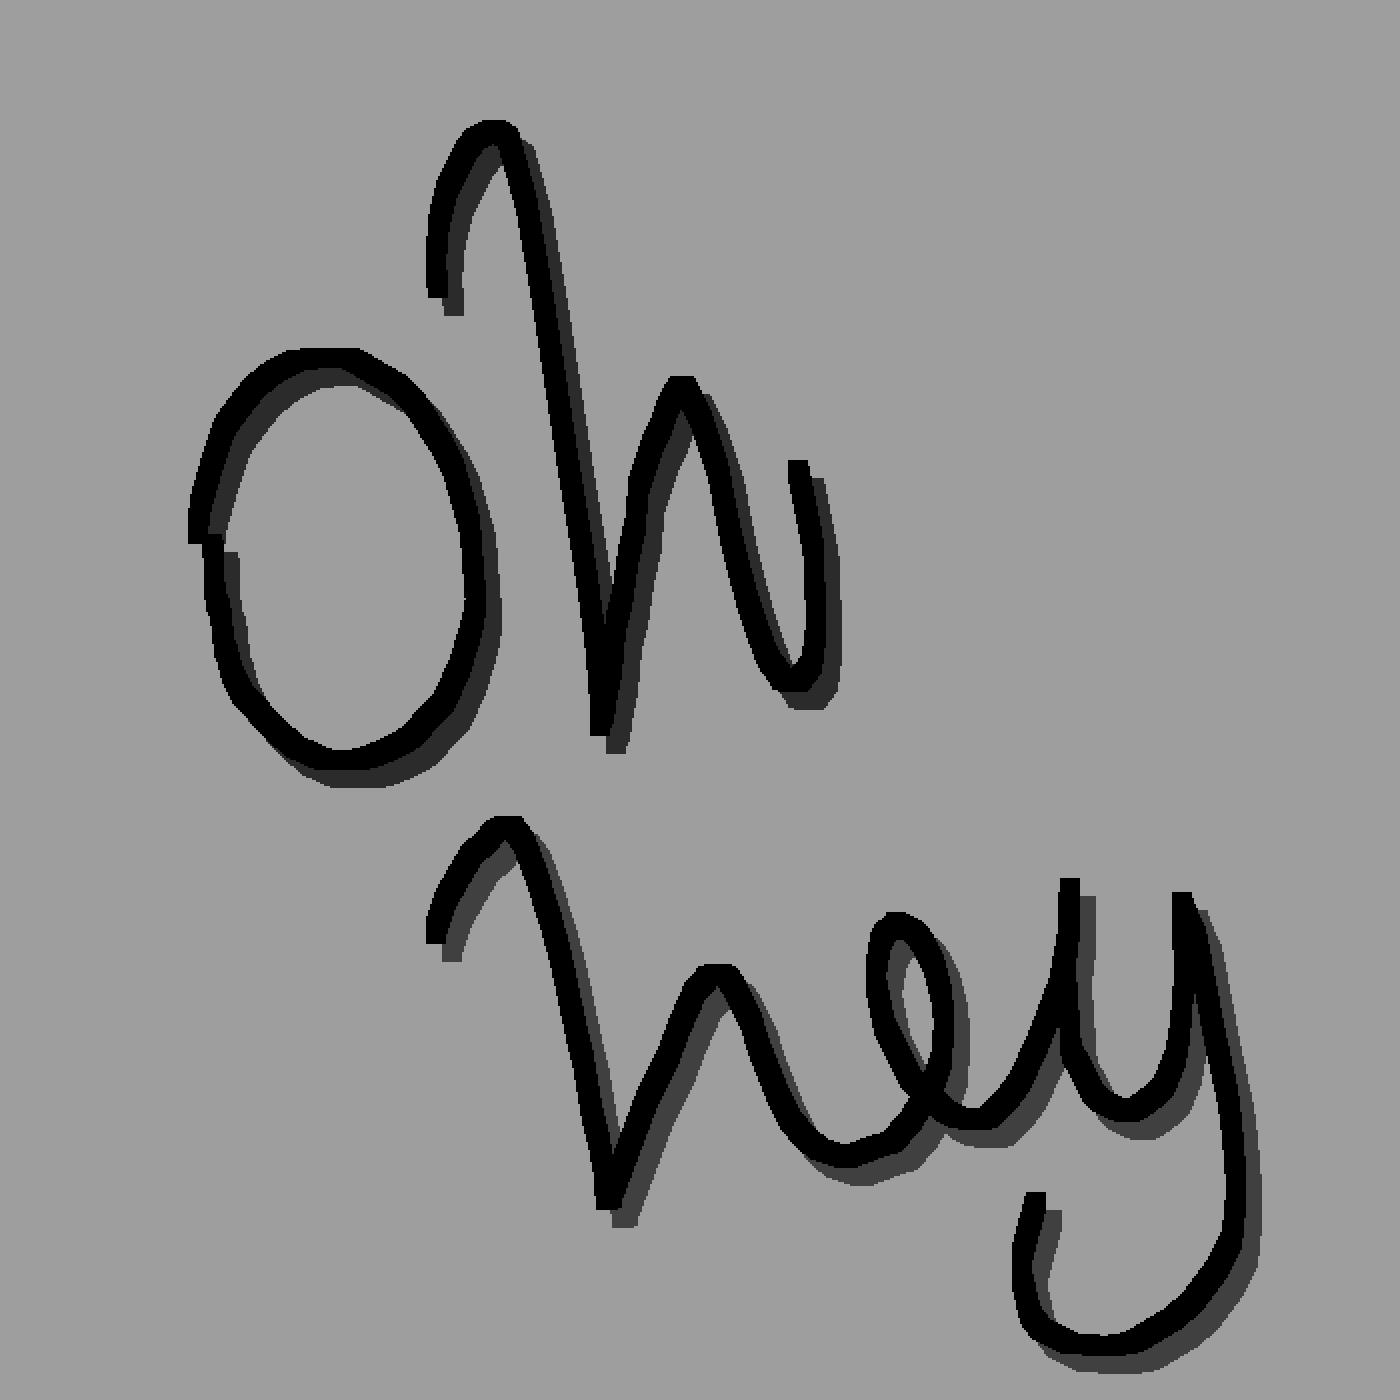 o hey by crispyensemble